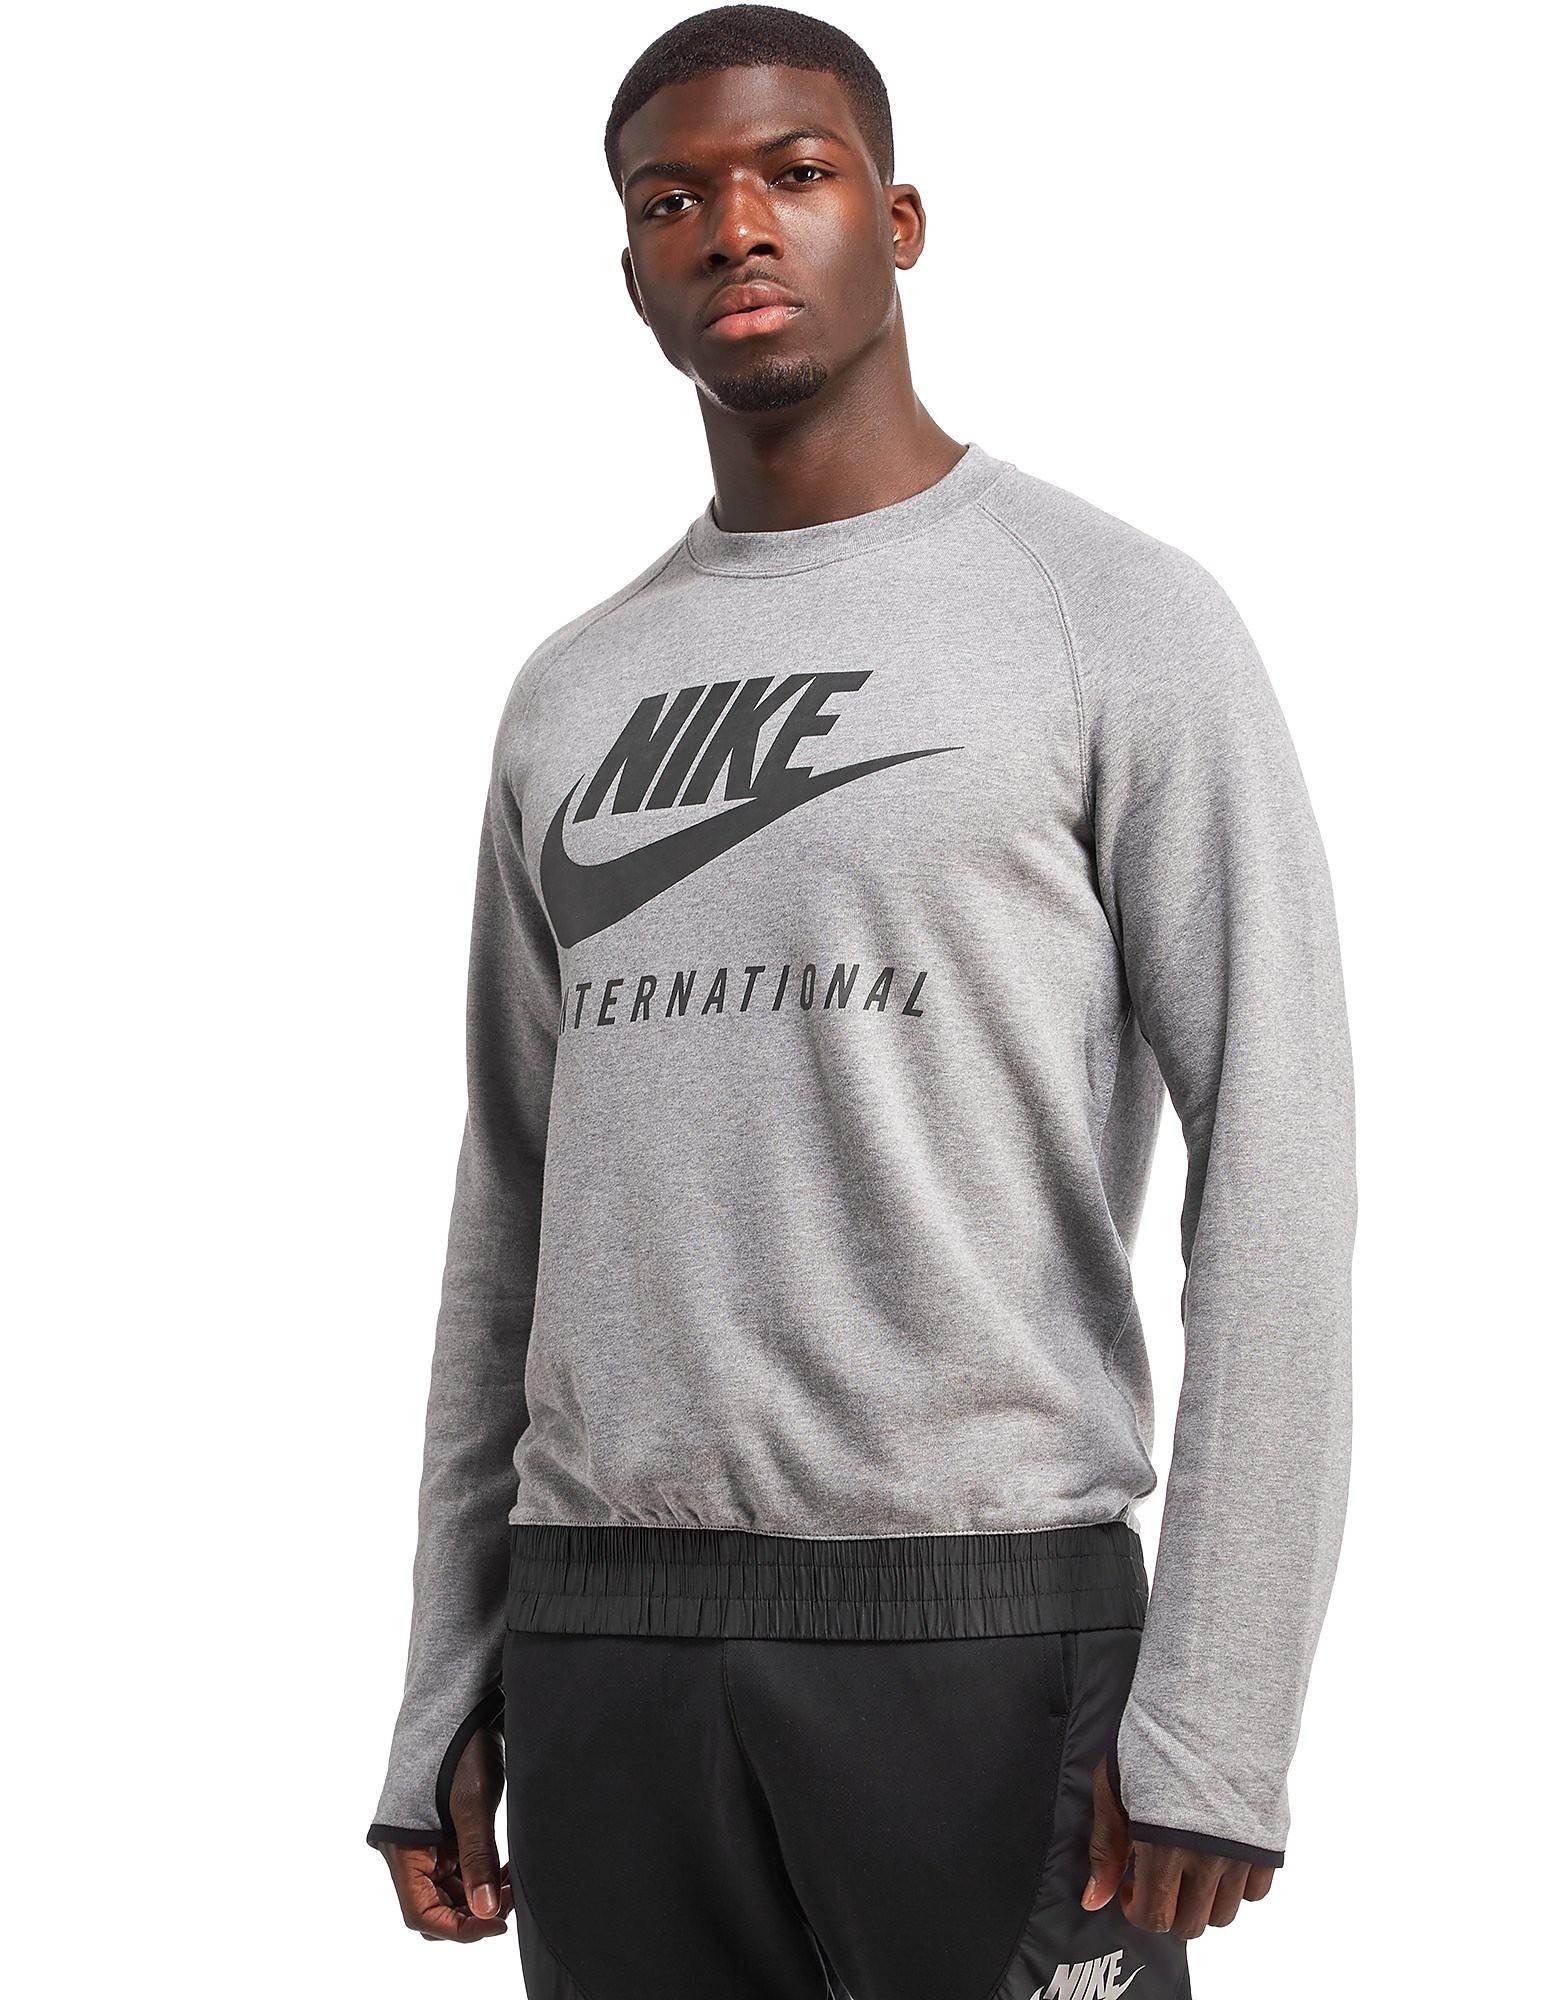 Nike International Crew Sweatshirt